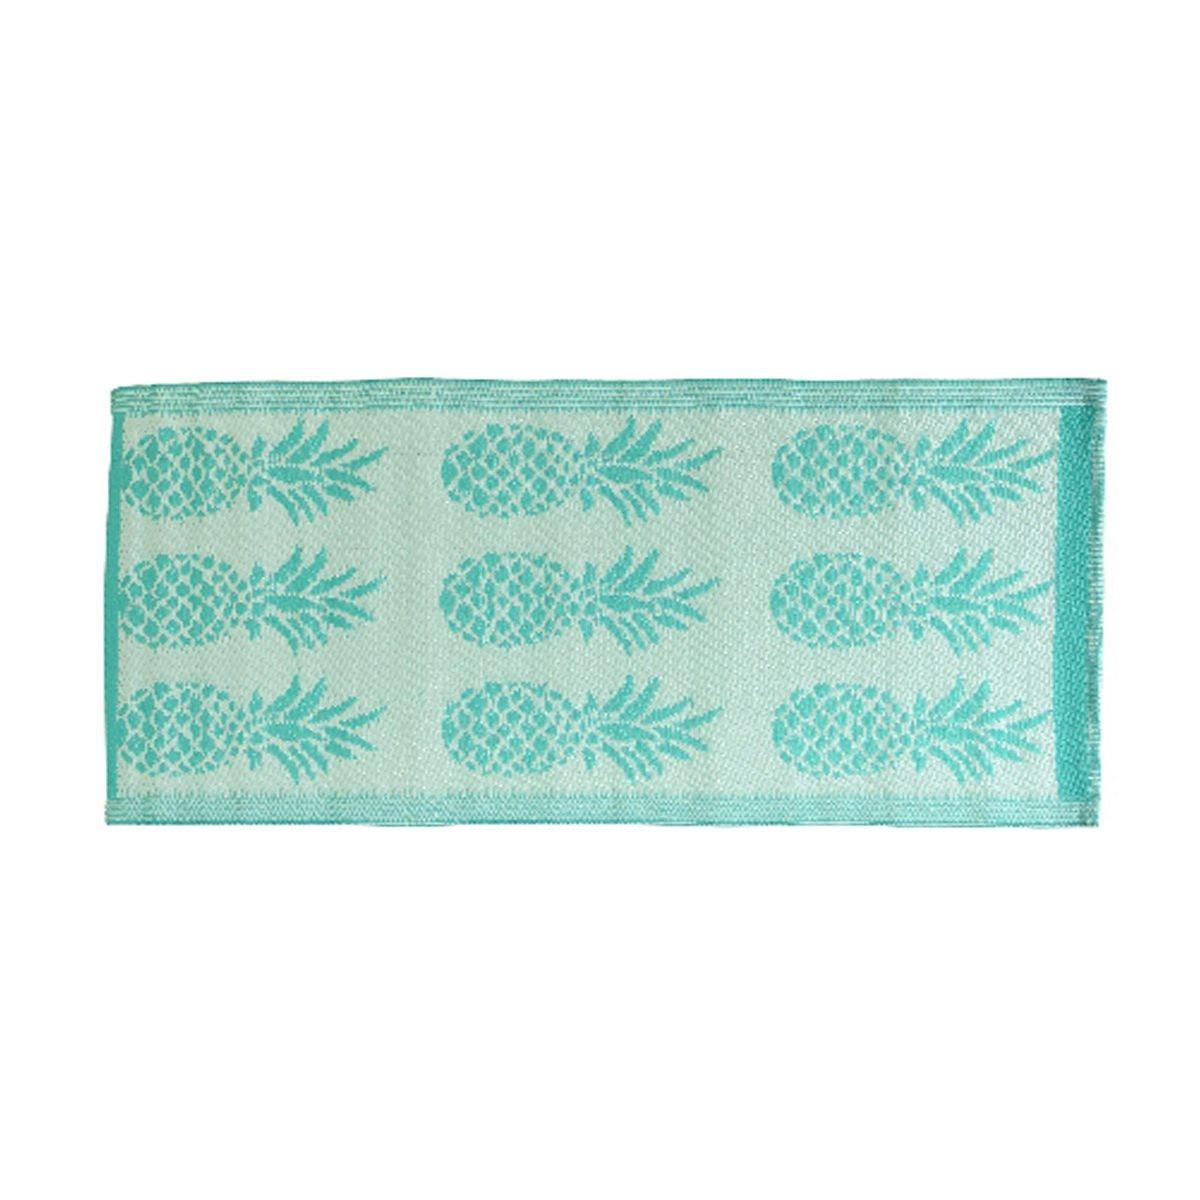 Tapis rectangulaire en polypropylène 140 x 70 cm motifs ananas Vert - Jardideco